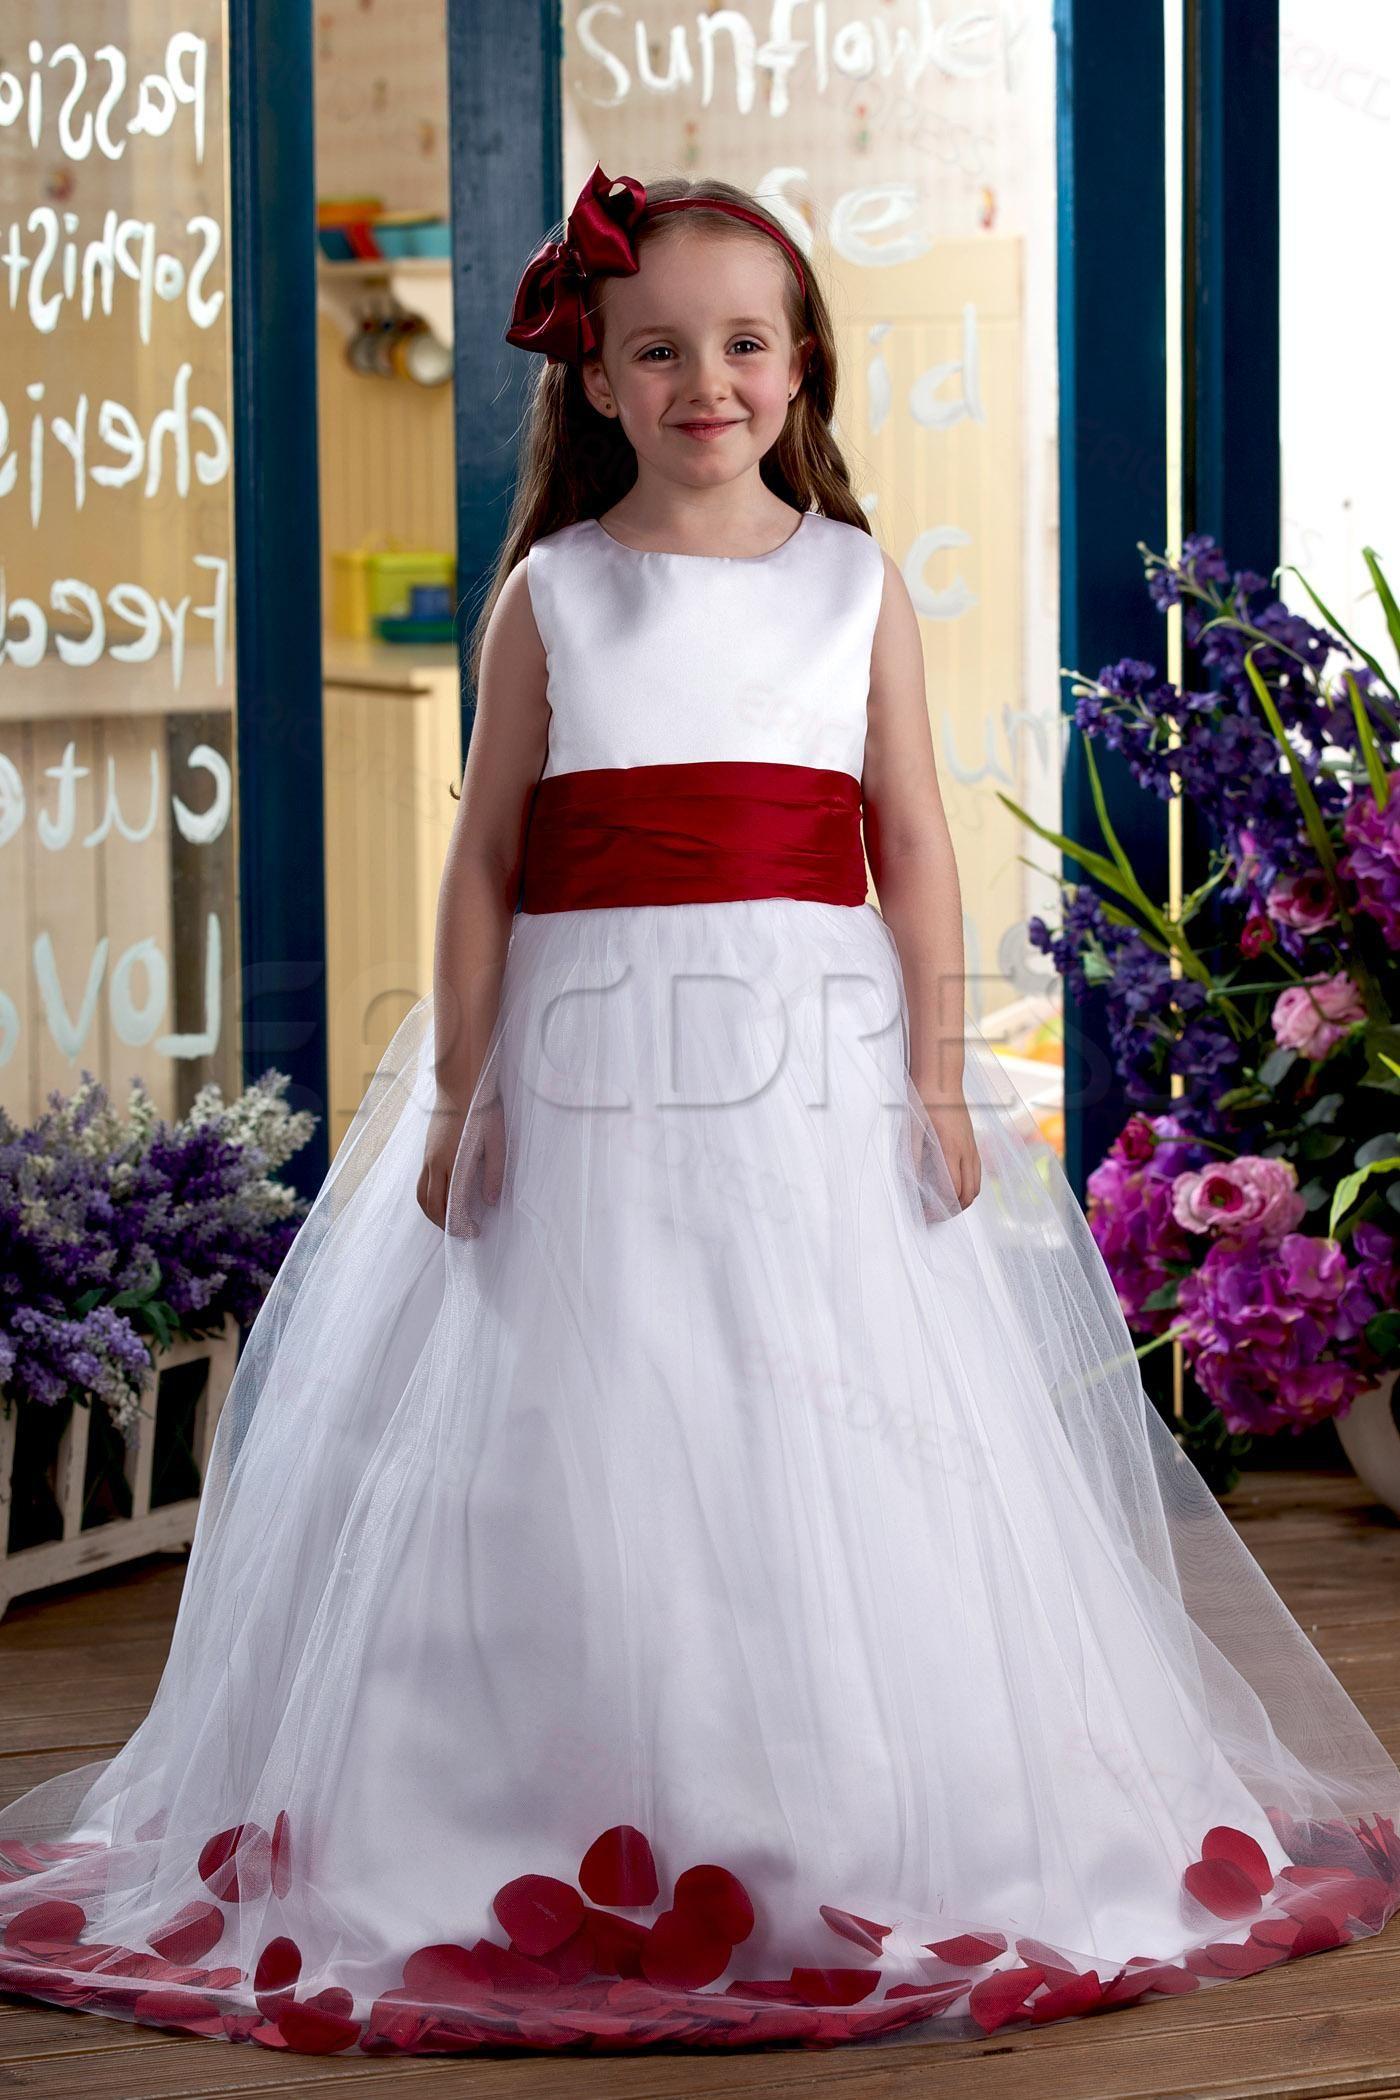 4bd5a636e Elegant Ball Gown Ankle-length Bateau Appliques Flower Girl Dress, find  more flower girl dress for your wedding. ericdress.com